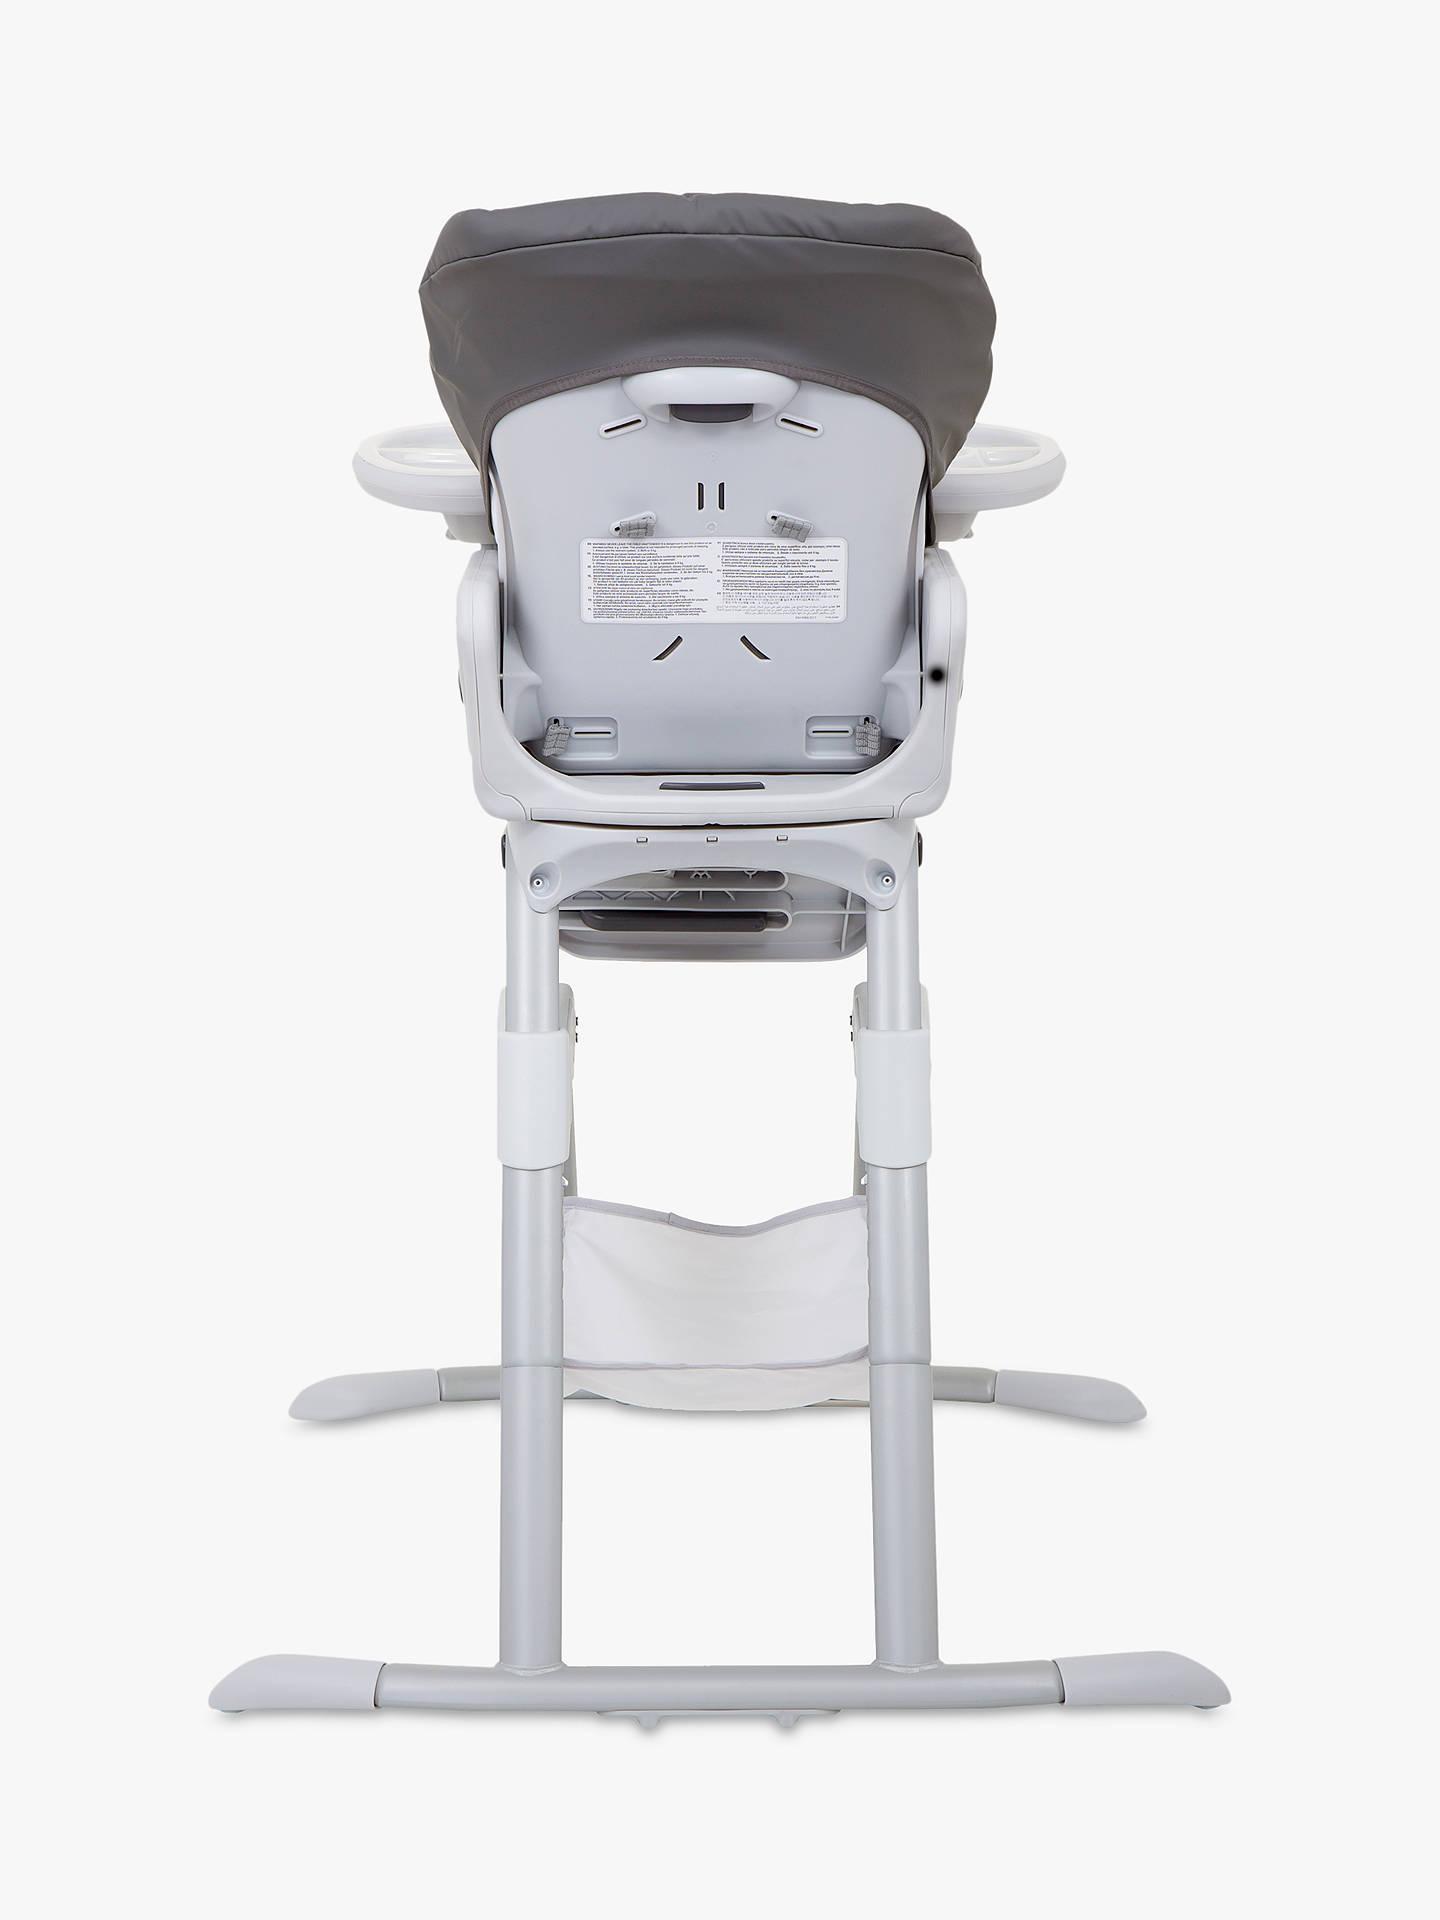 Phenomenal Joie Mimzy 3 In 1 Spin Highchair Geometric Mountains Creativecarmelina Interior Chair Design Creativecarmelinacom